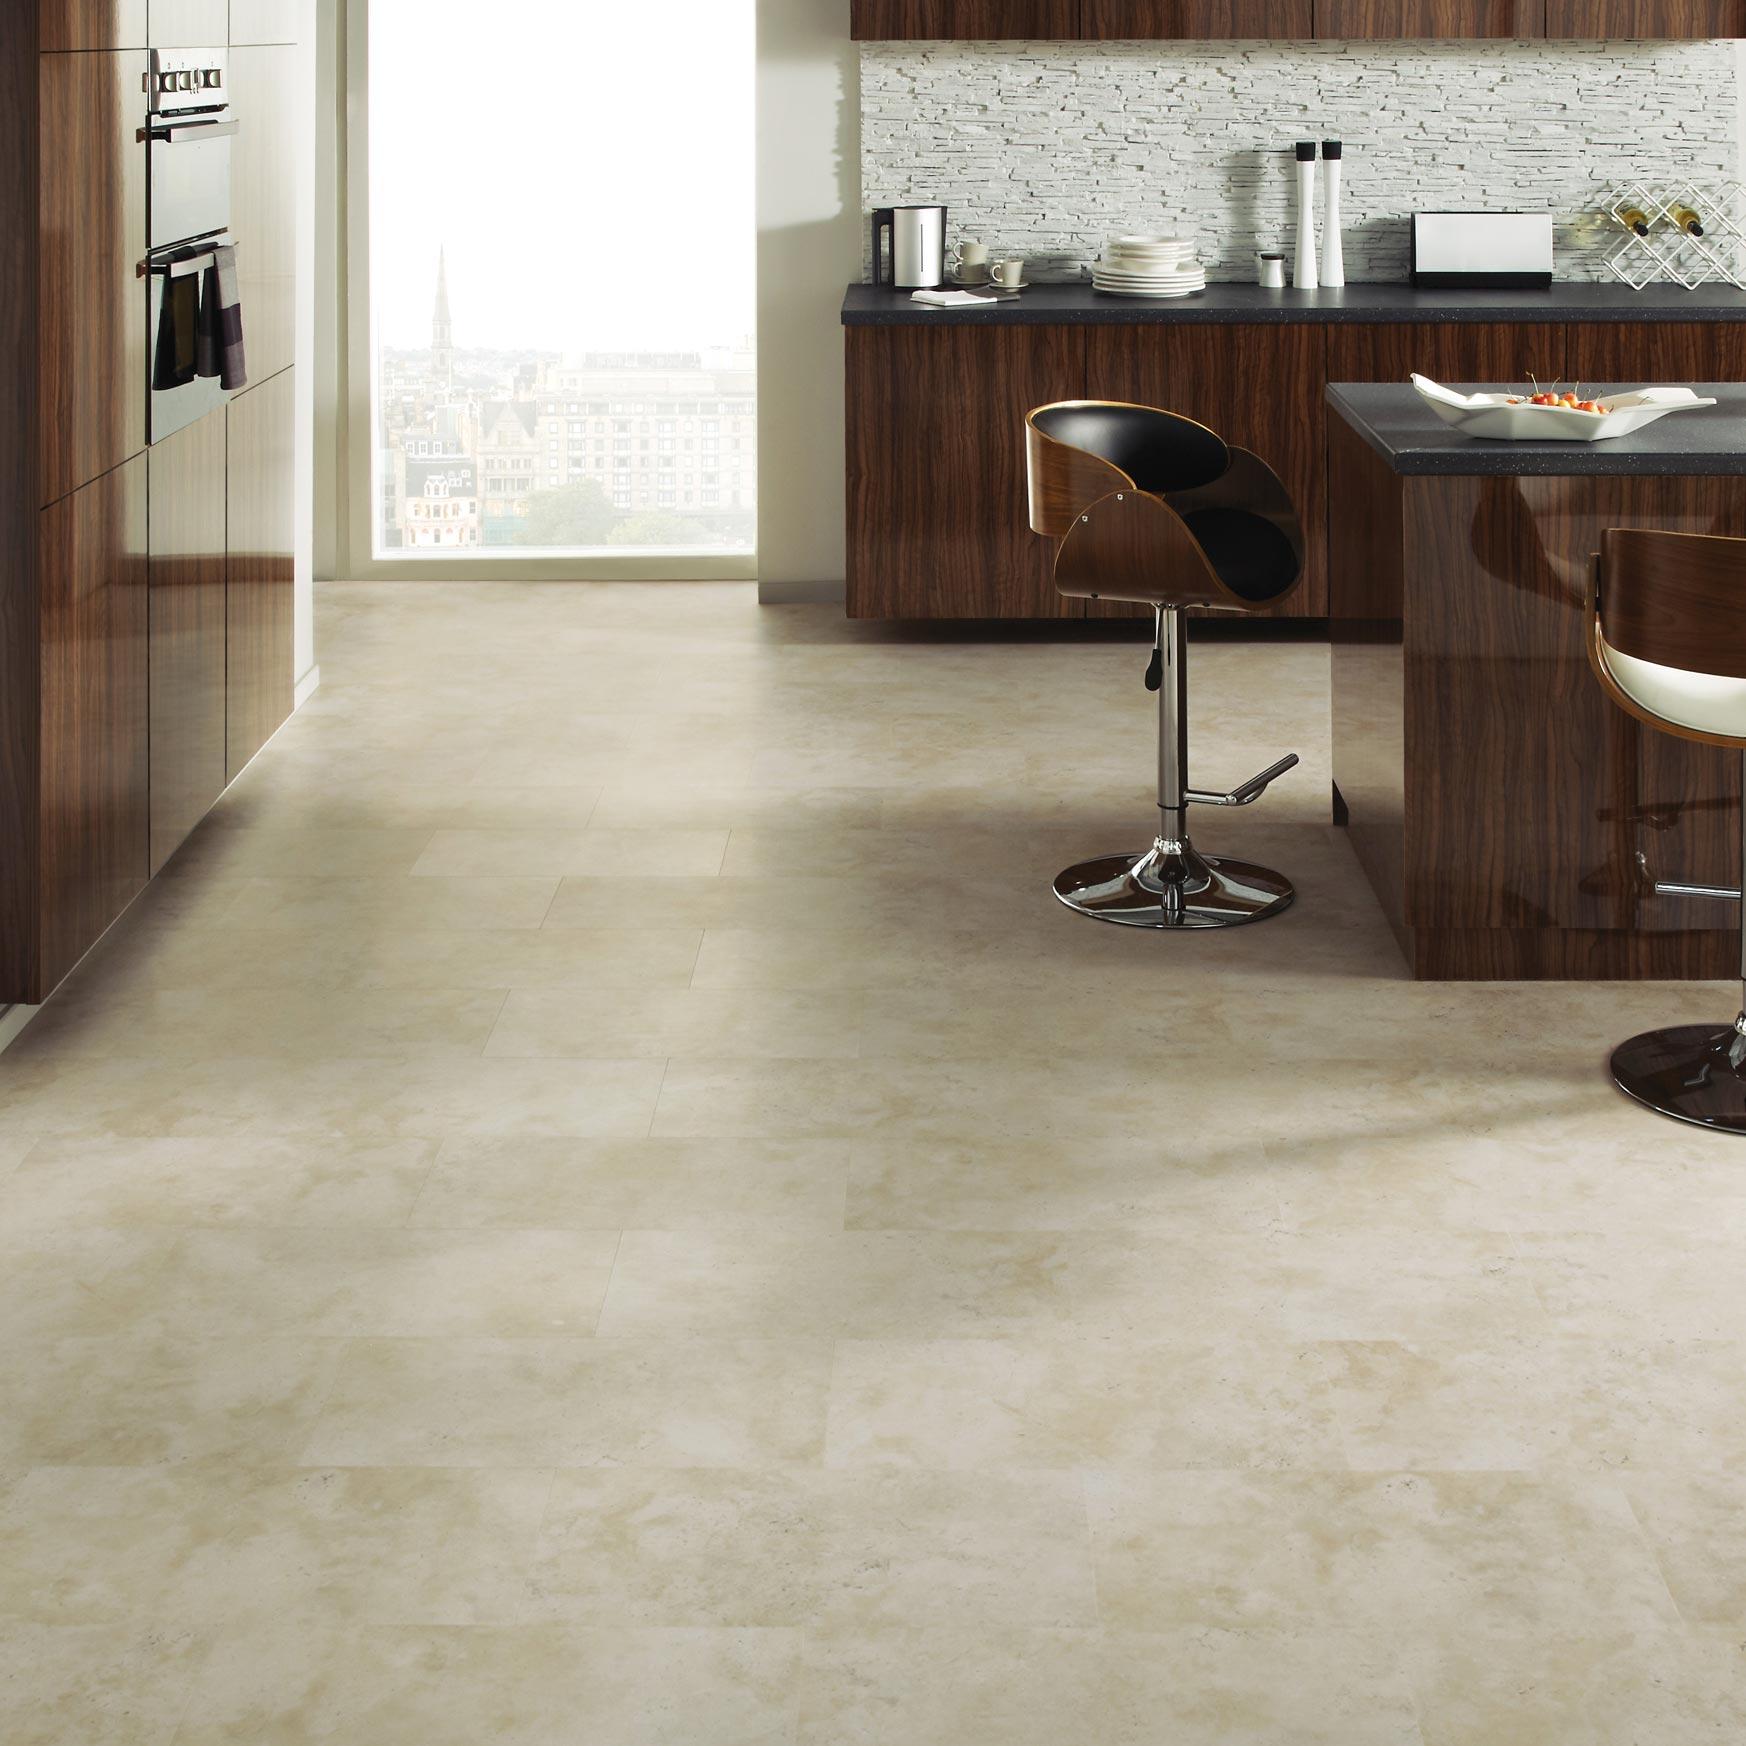 karndean flooring karndean palio murlo ct4302 clic vinyl tile ... VKLSORM